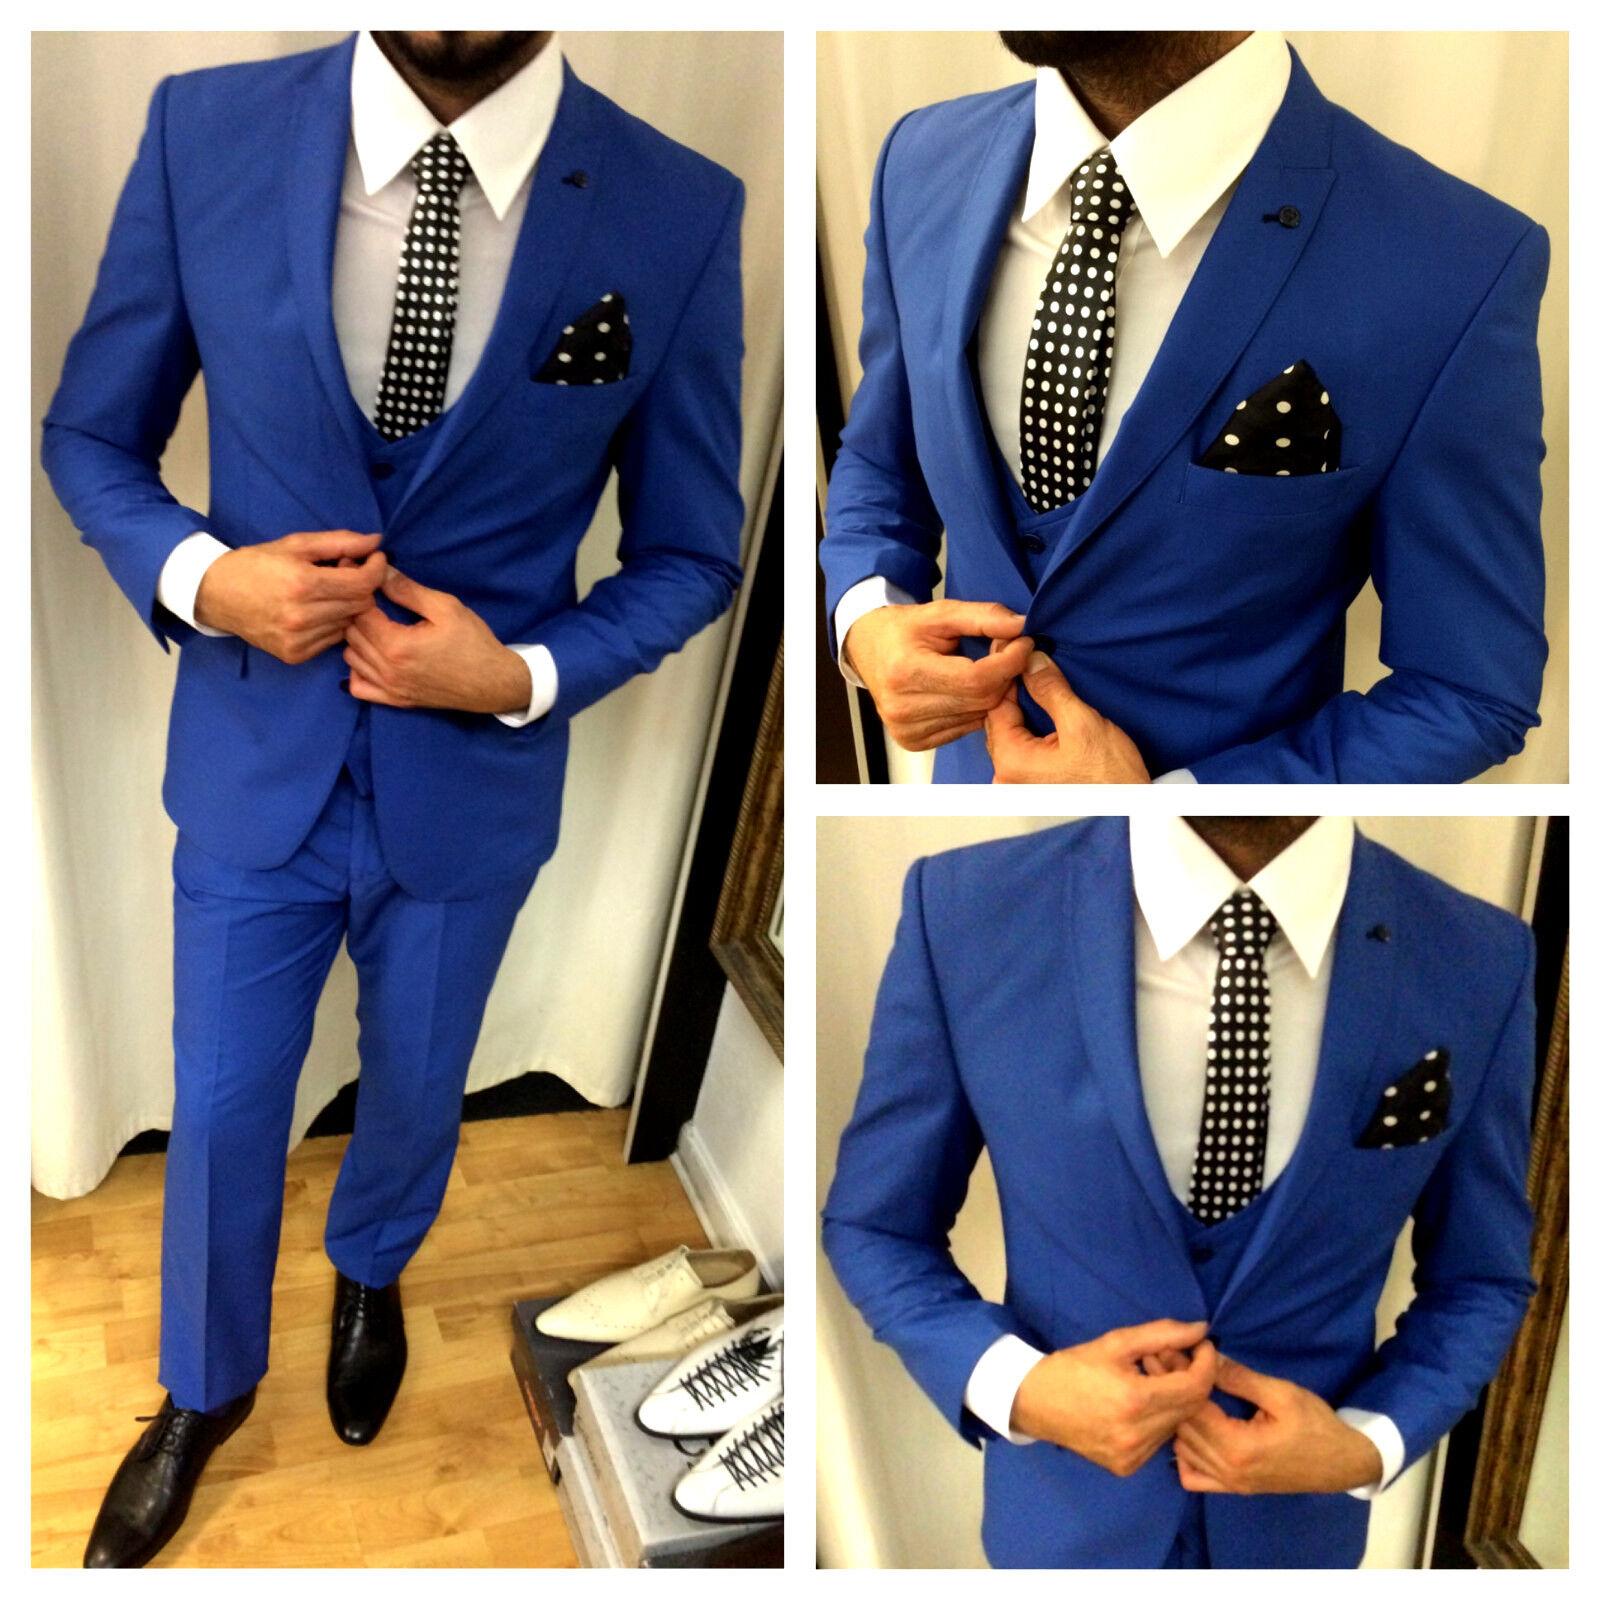 suitmen edler designer blau anzug weste tailliert set passendem hemd krawatte 54 eur 299 90. Black Bedroom Furniture Sets. Home Design Ideas